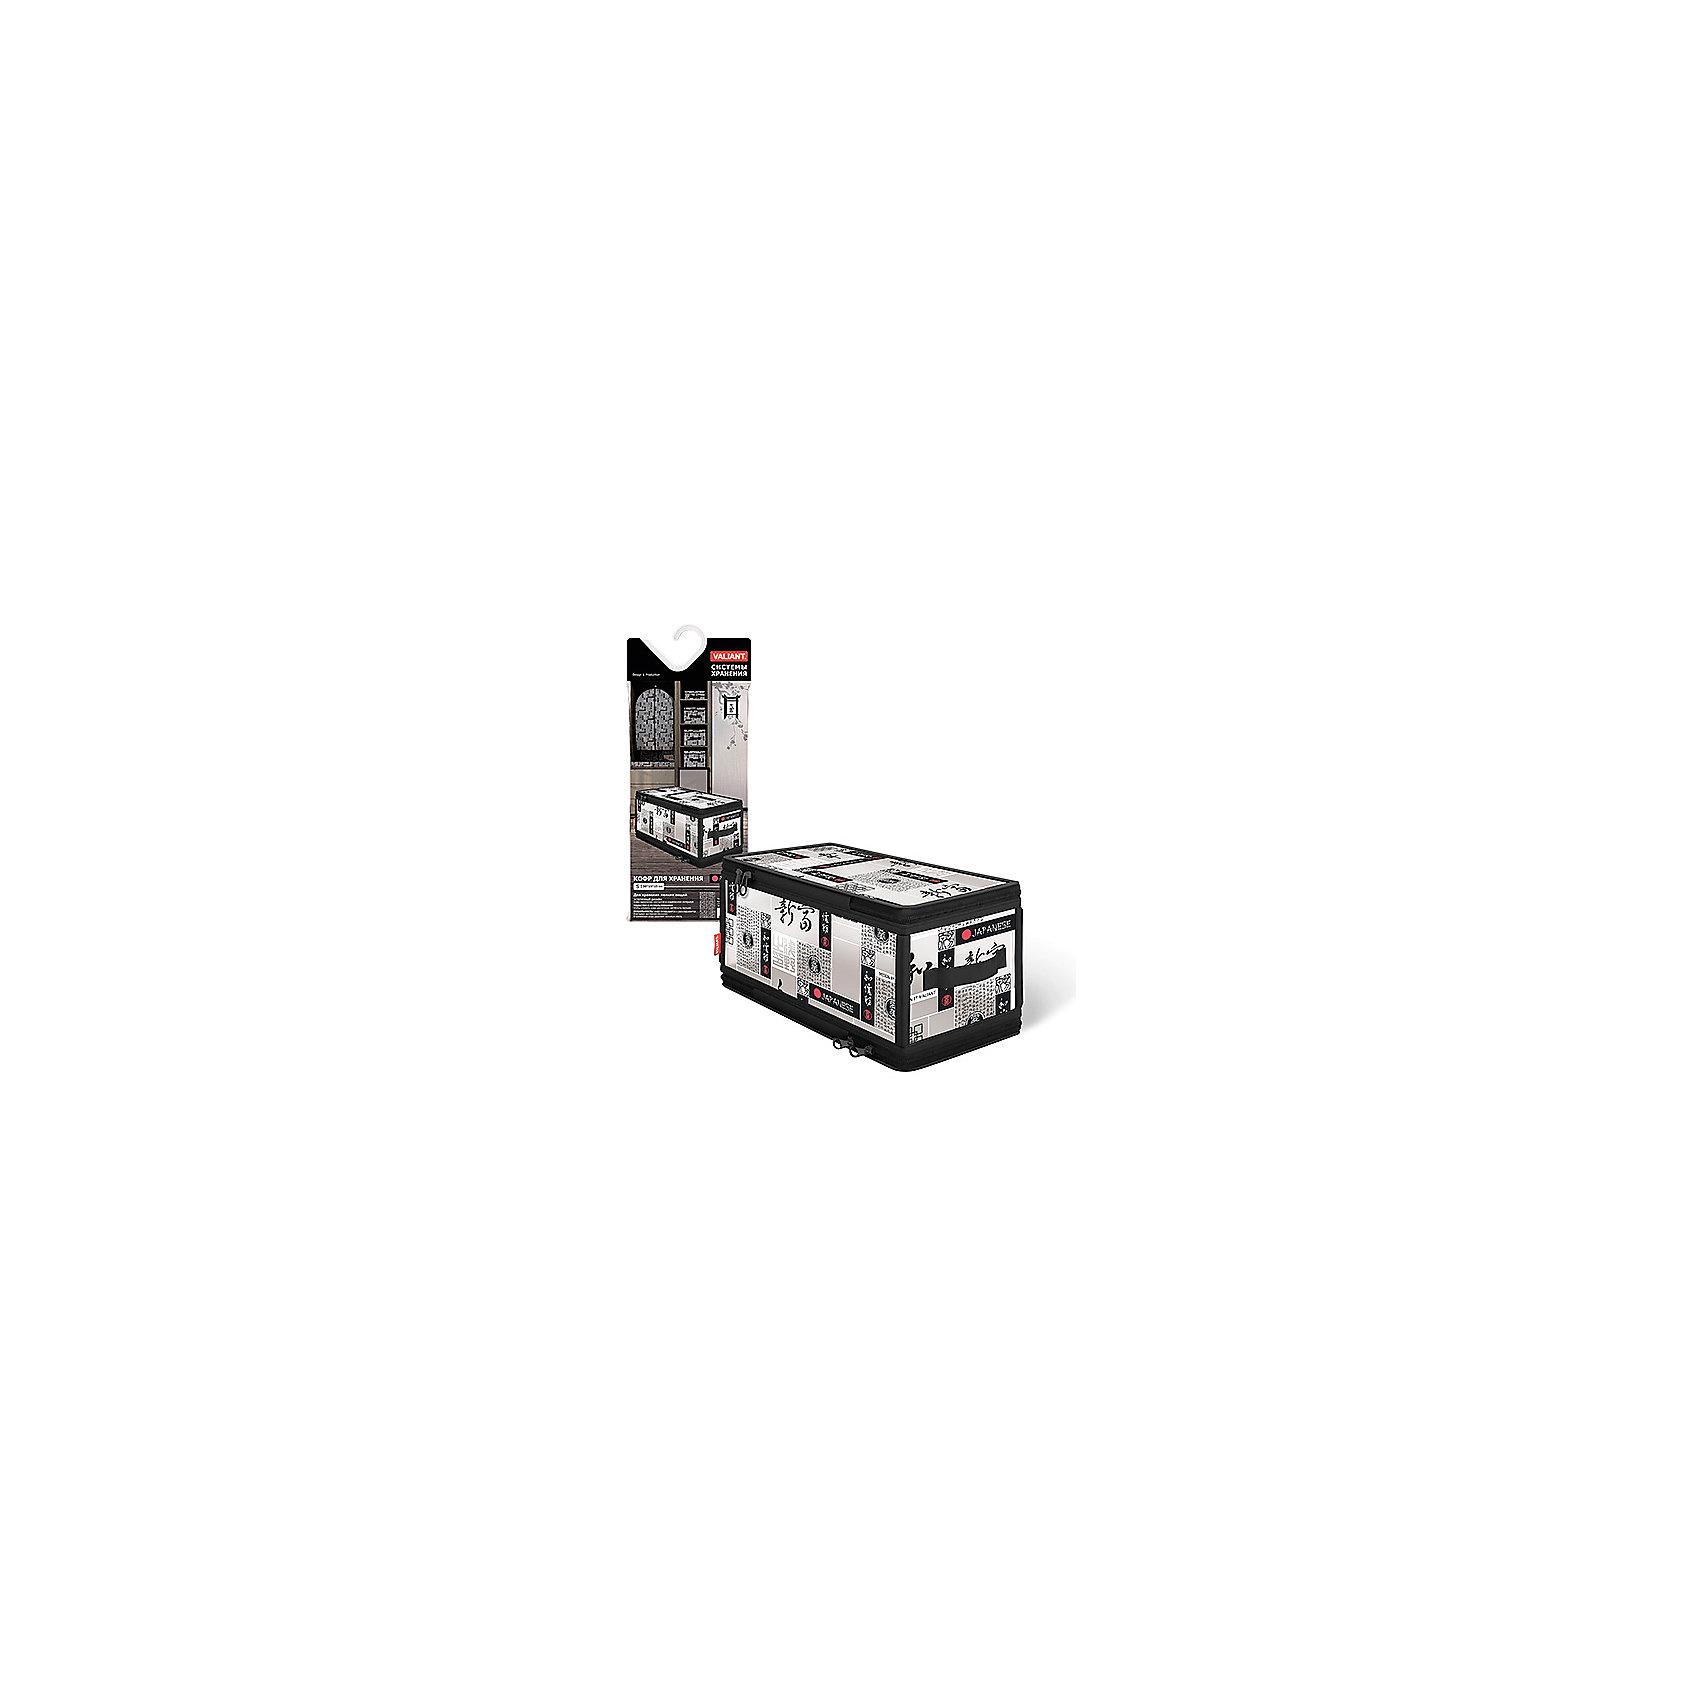 VALIANT Кофр для хранения с застёжкой-молнией, 30*15*15 см, JAPANESE BLACK, Valiant кофр для хранения valiant japanese white с застежкой молнией 30 х 28 х 15 см